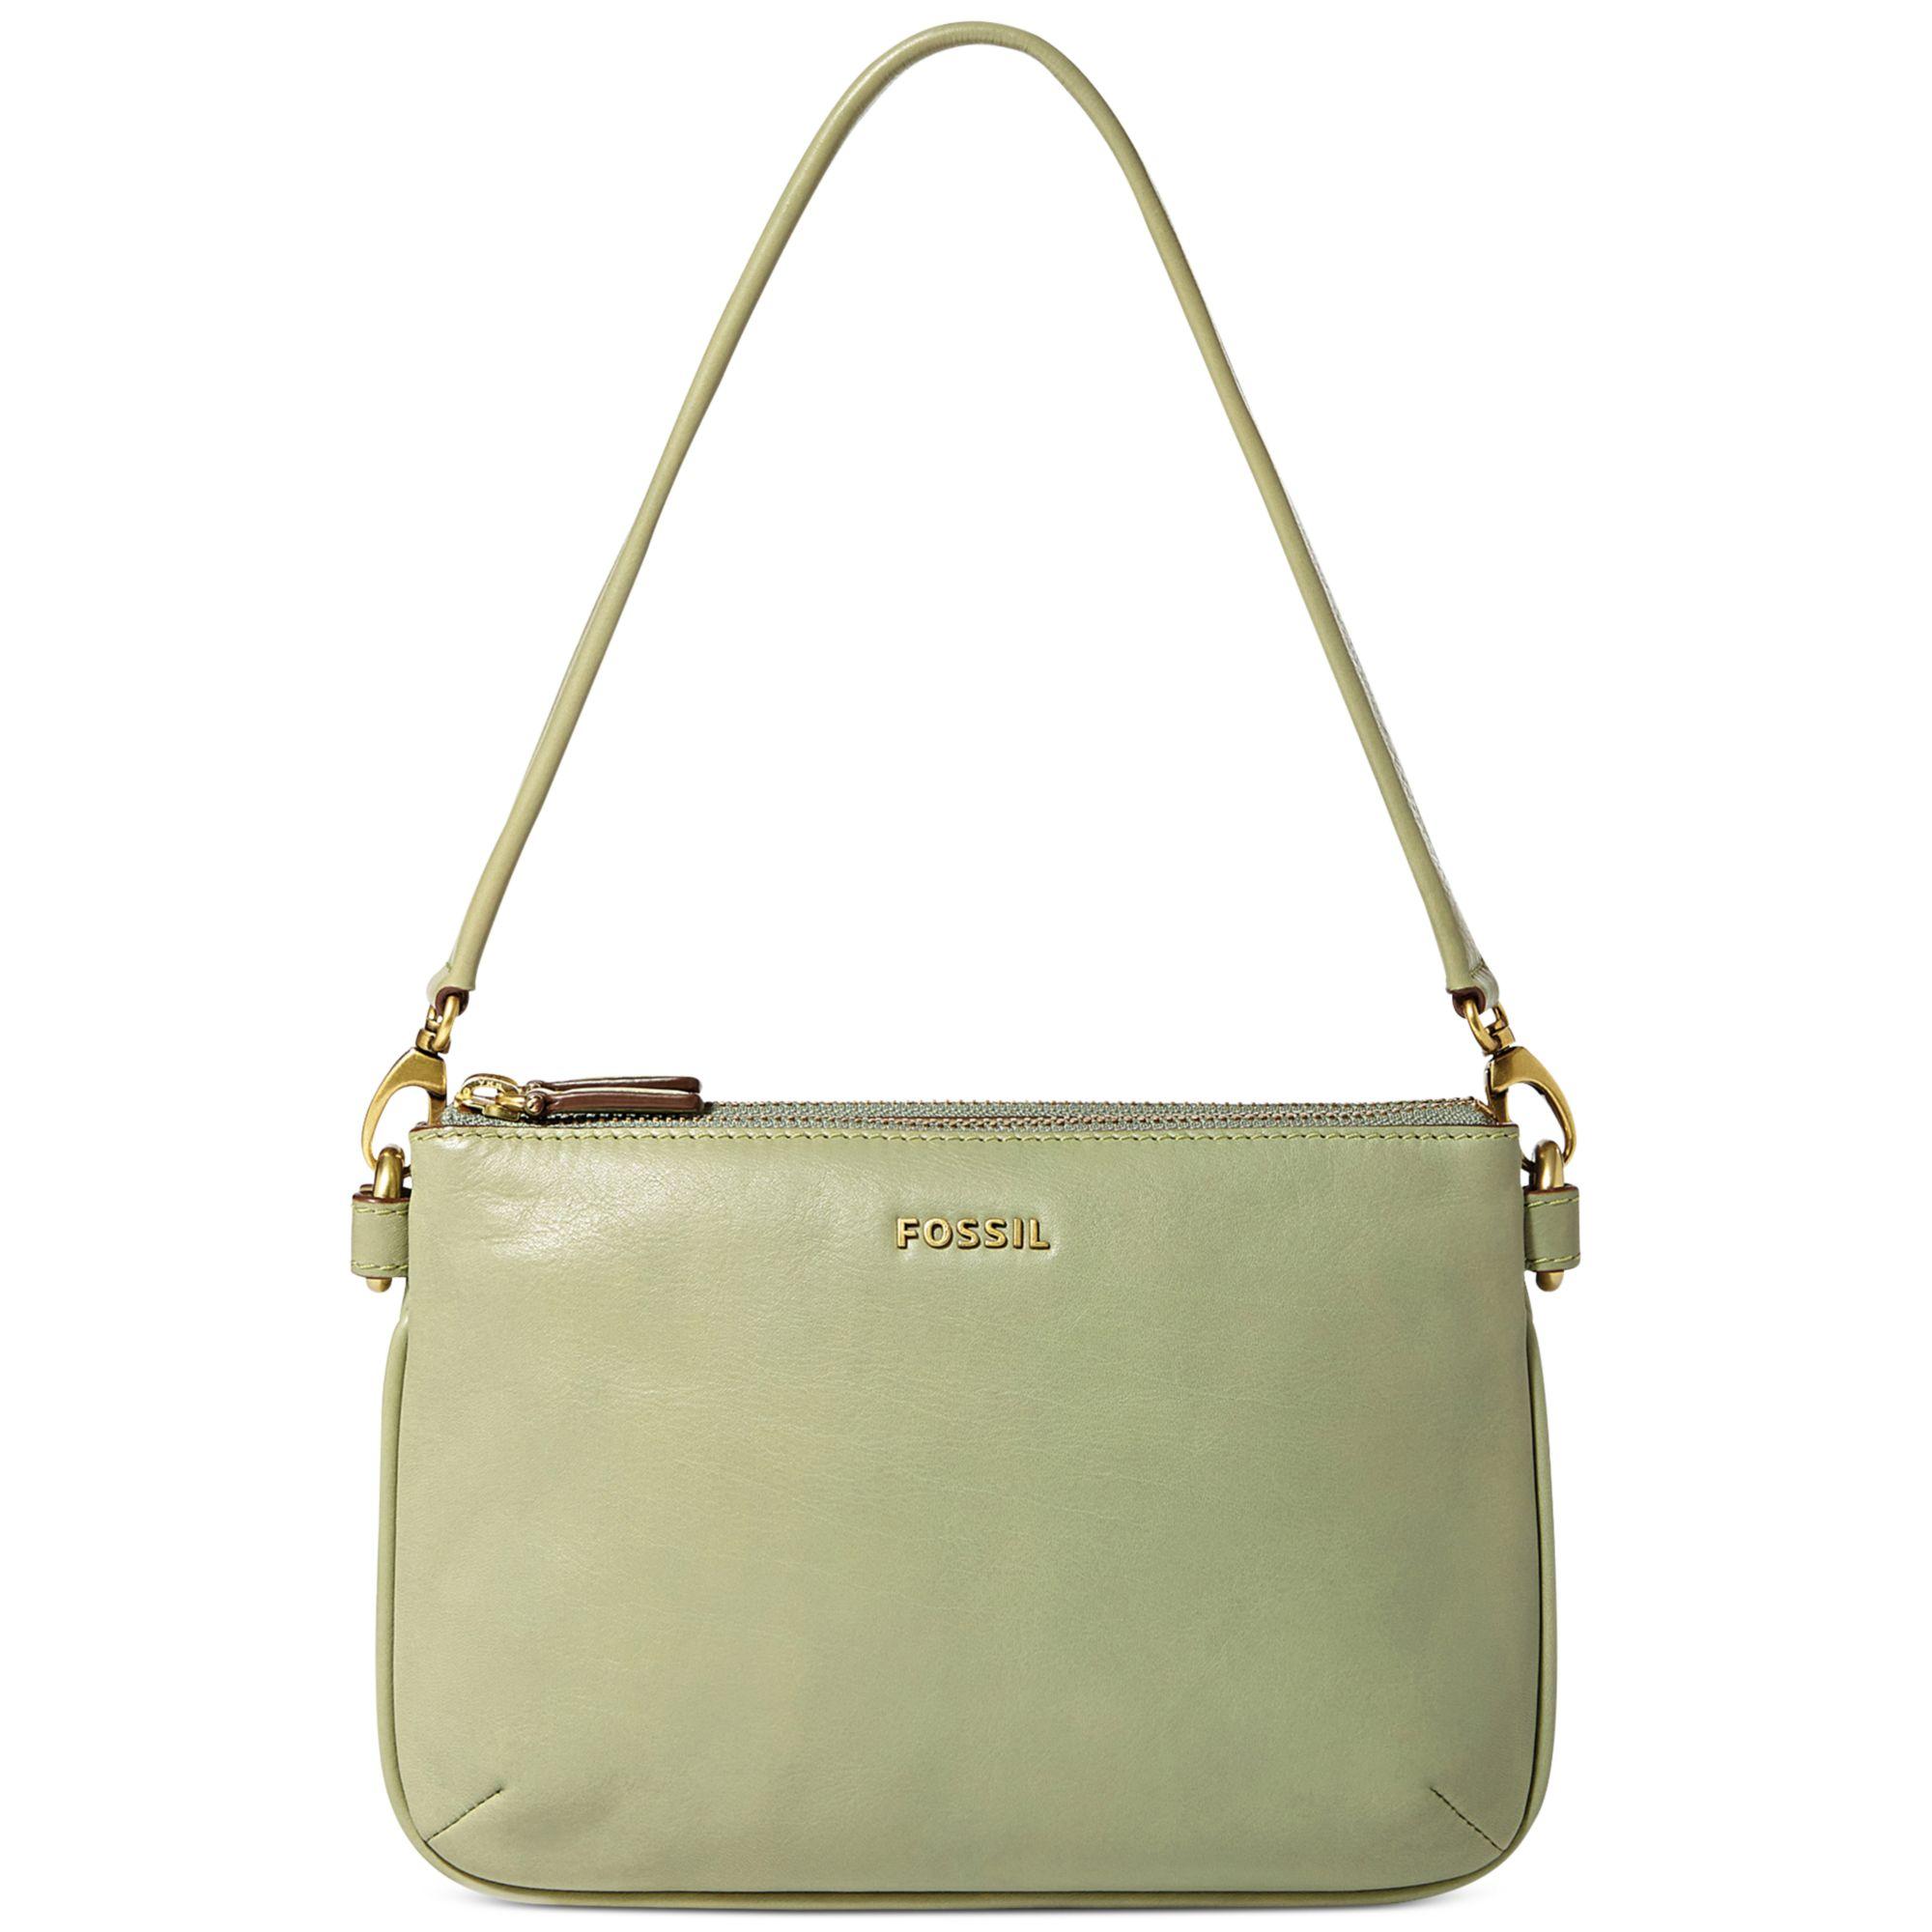 Fossil Memoir Pocketbook Top Zip Shoulder Bag in Green | Lyst